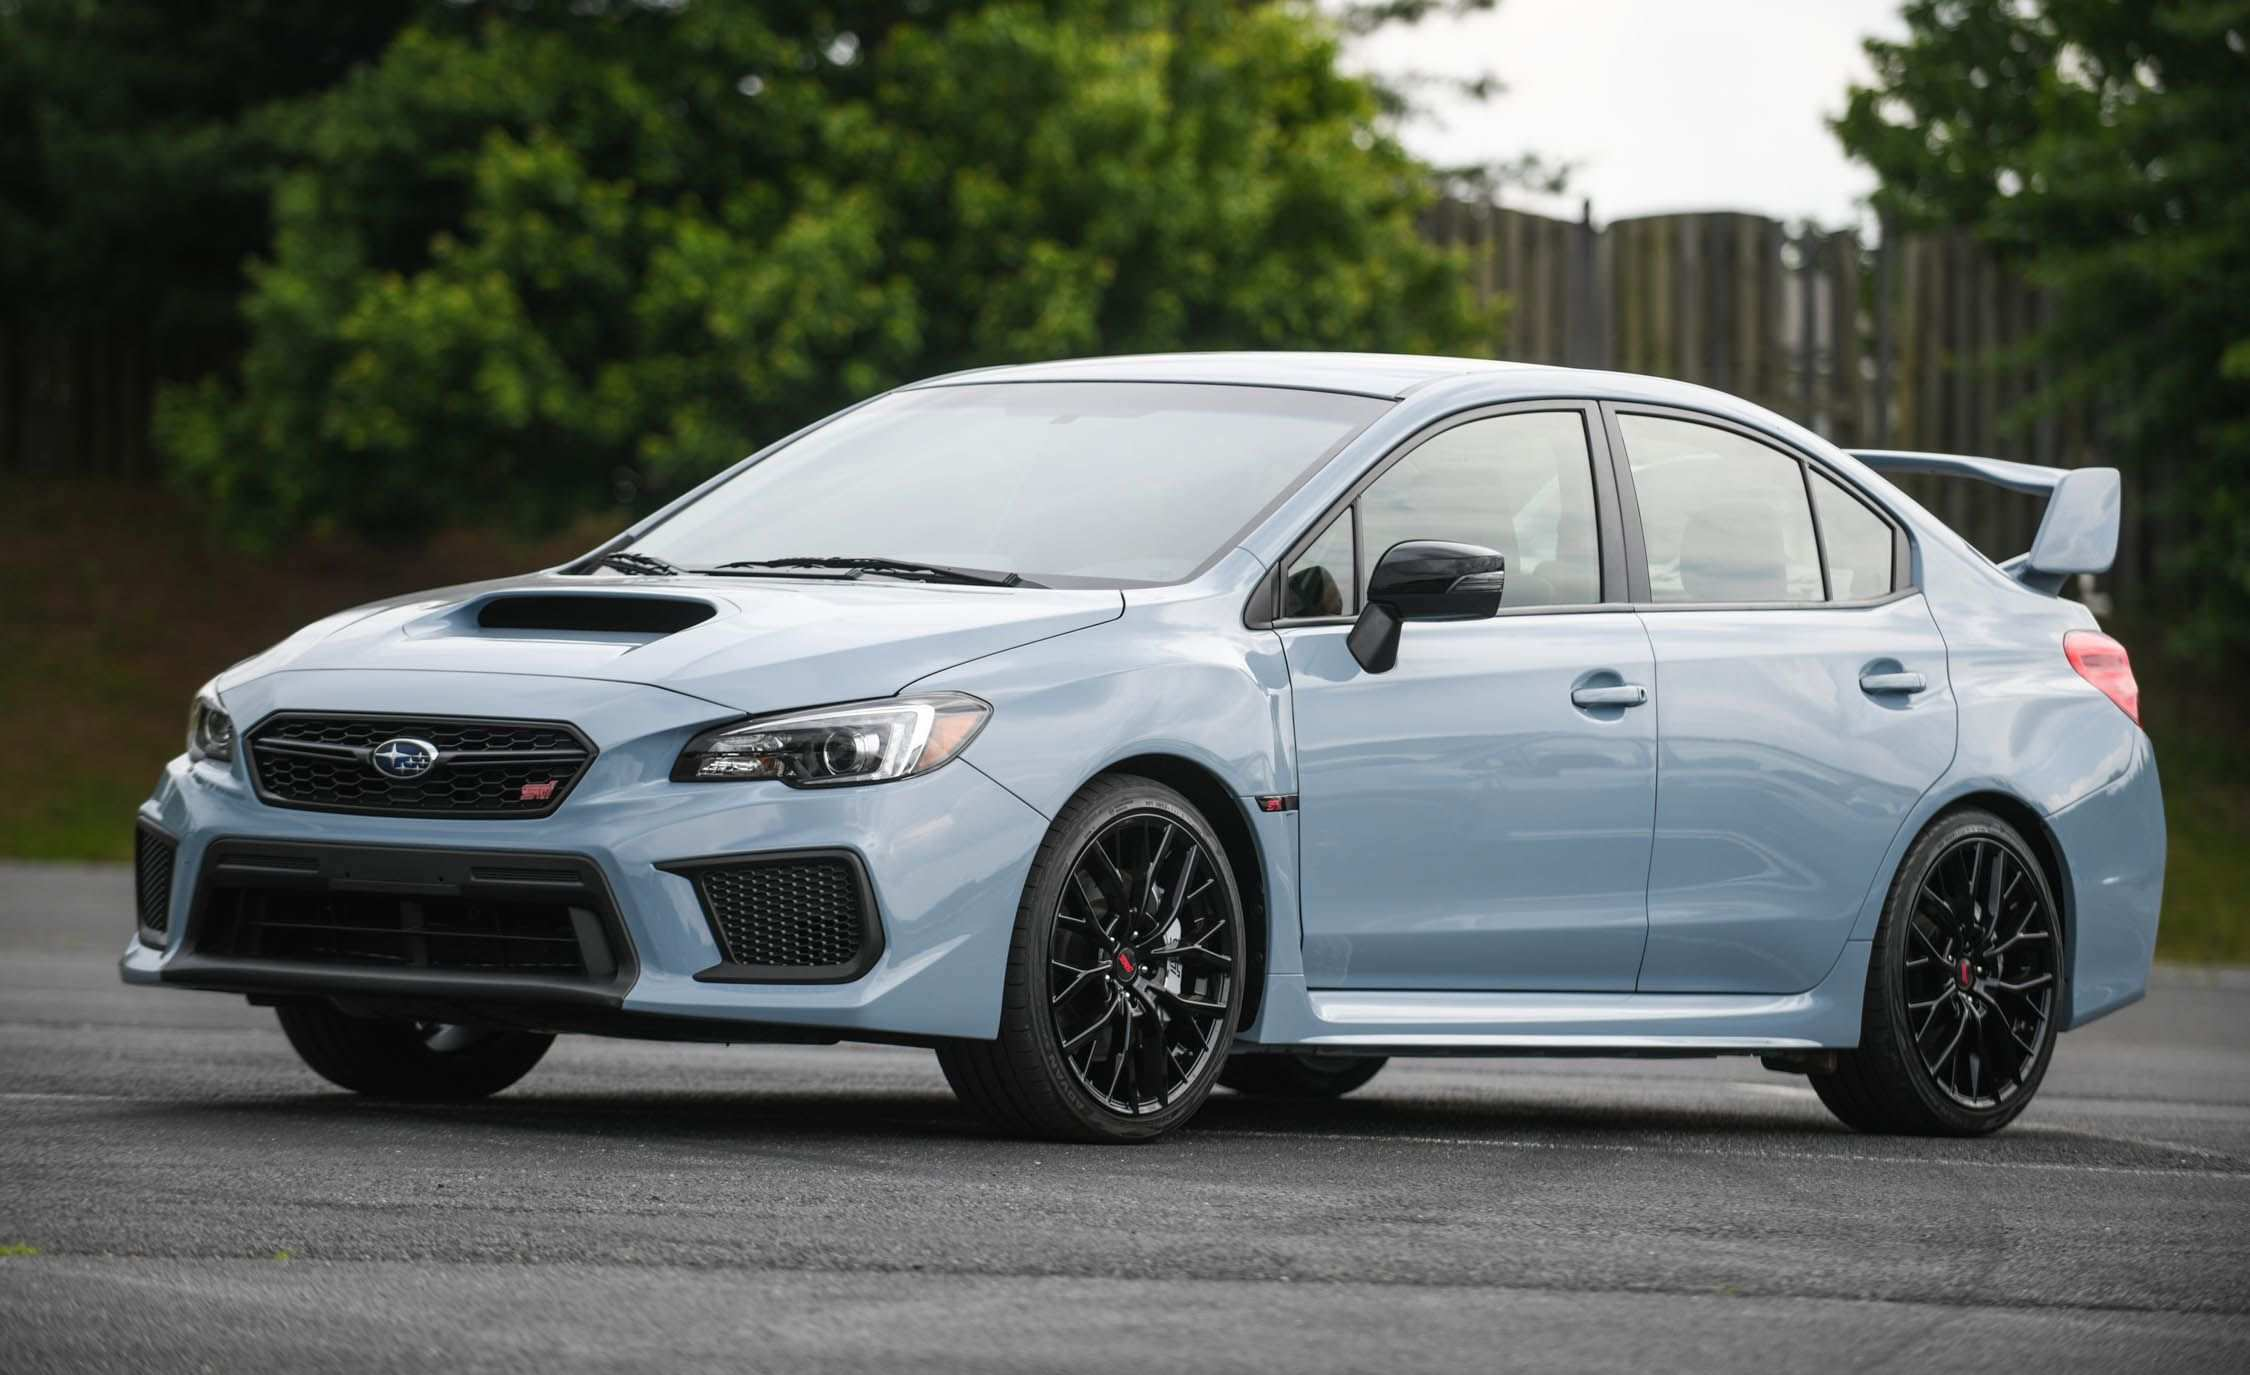 18 Concept of 2019 Subaru Wrx Sti Review Model by 2019 Subaru Wrx Sti Review